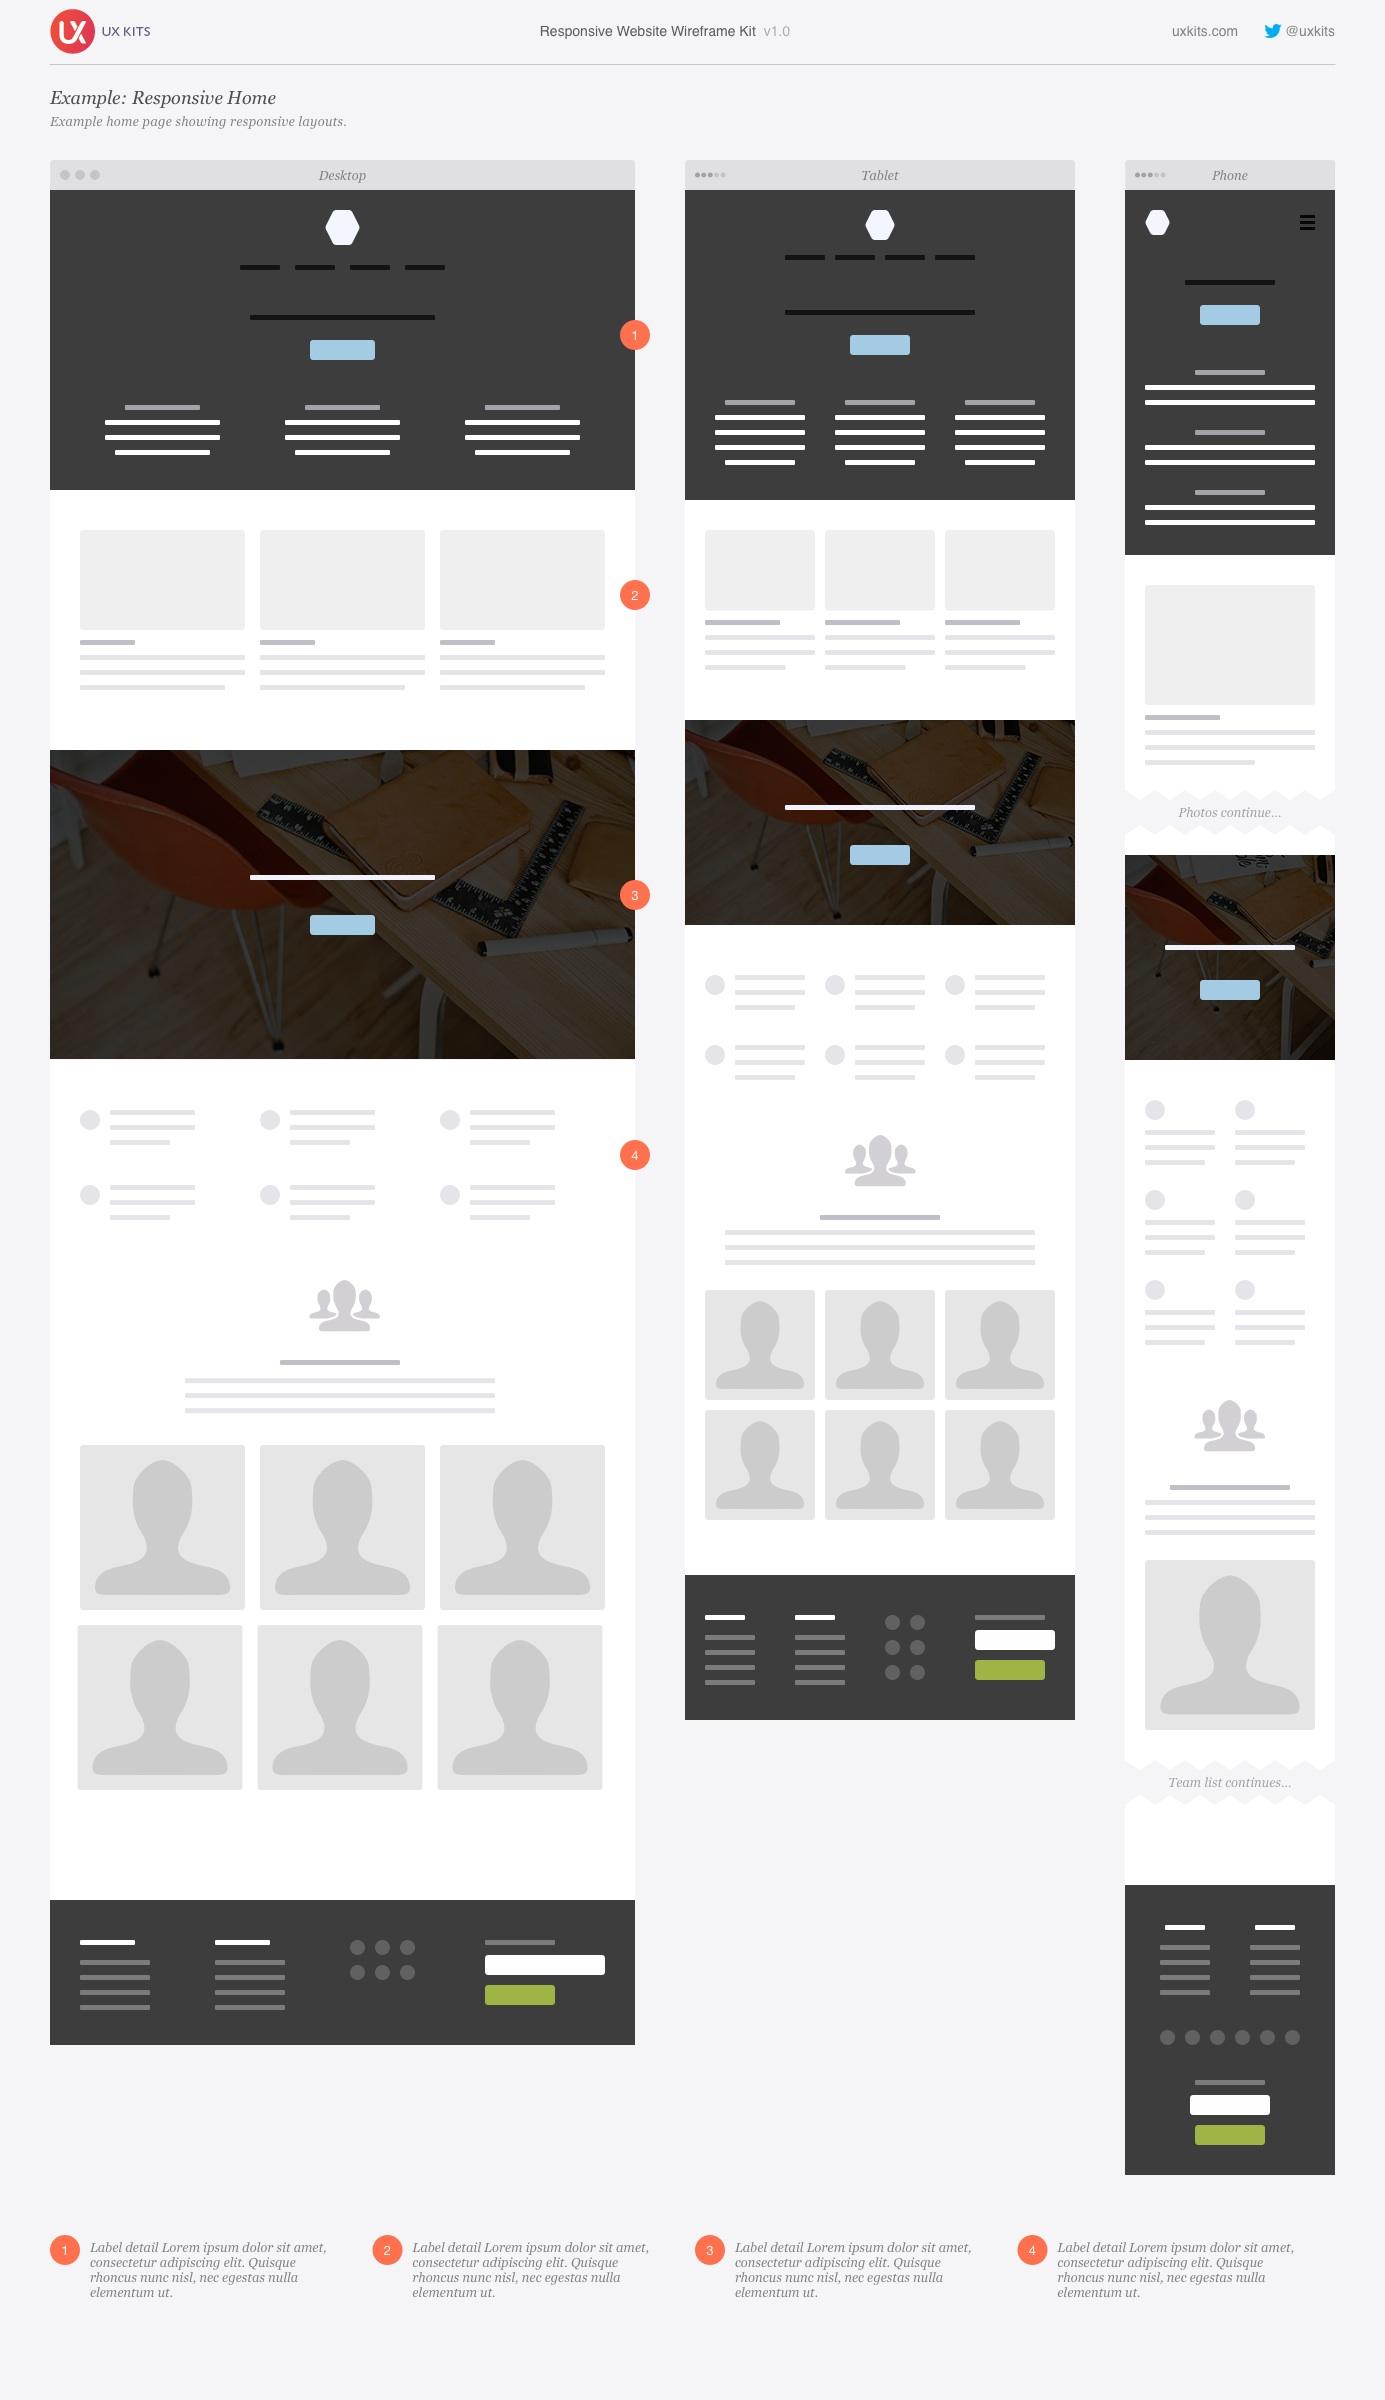 responsive website wireframe kit